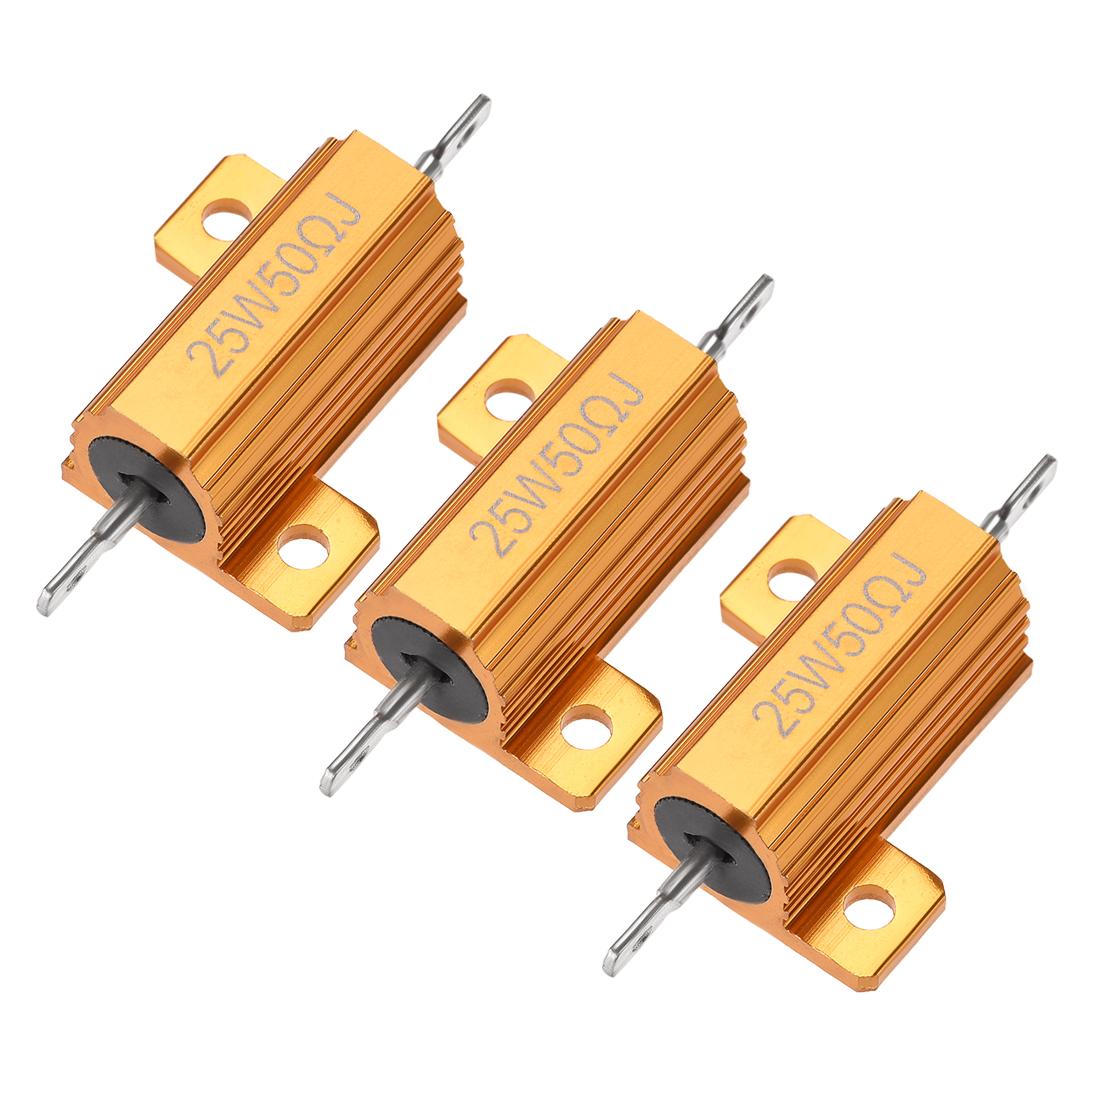 25W 50 Ohm 5% Aluminum Housing Resistor Wirewound Resistor Gold Tone 3 Pcs